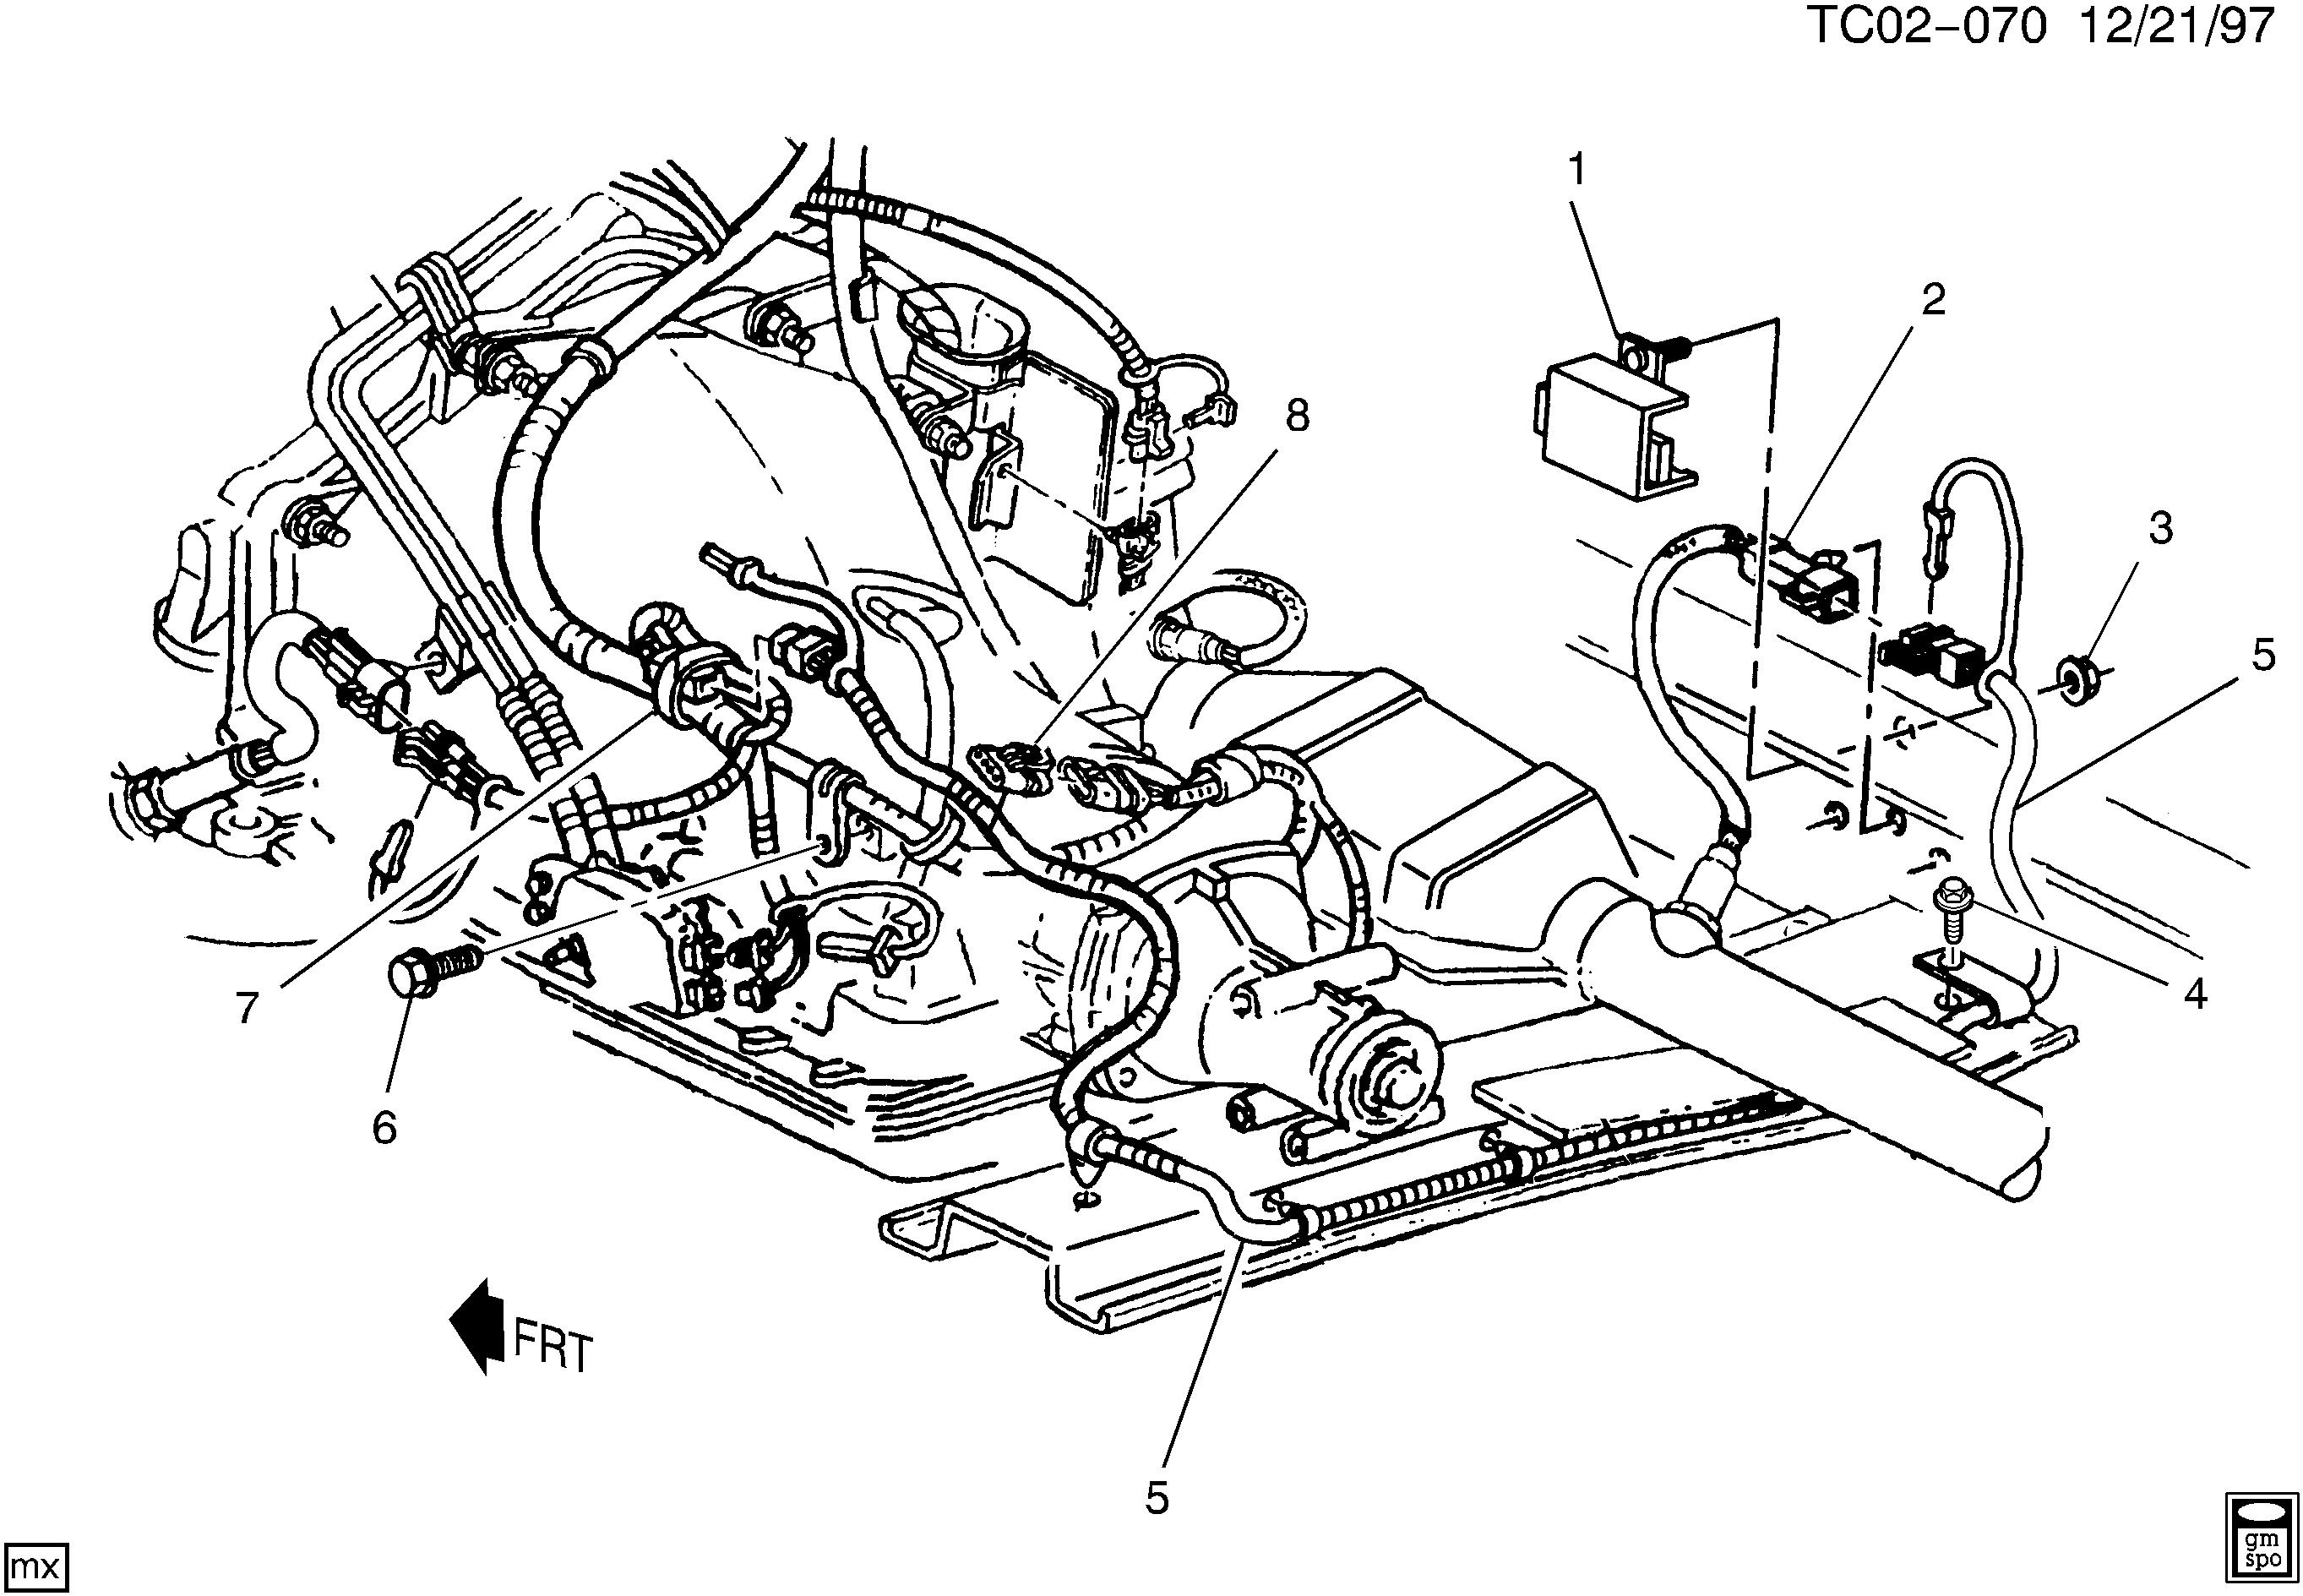 k1500 pickup 4wd - carryover model  oxygen